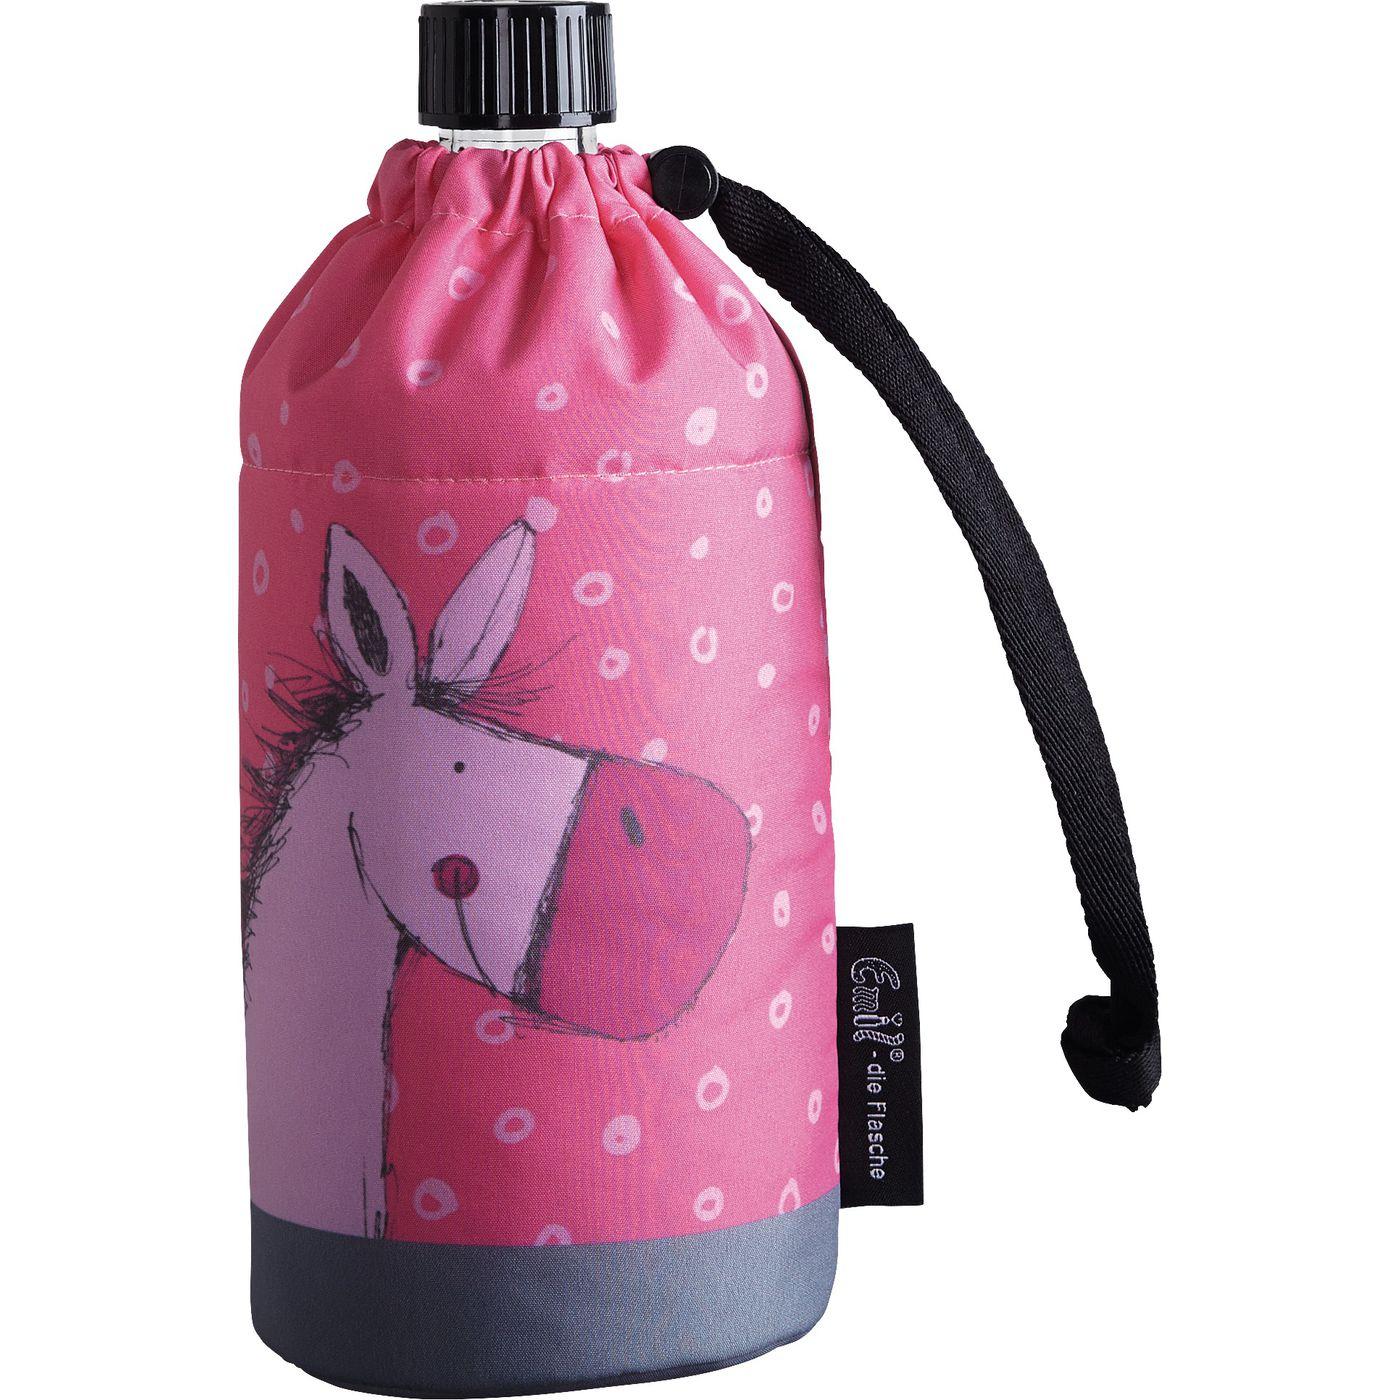 Эмиль бутылка JAKO‑O, 0,4 л